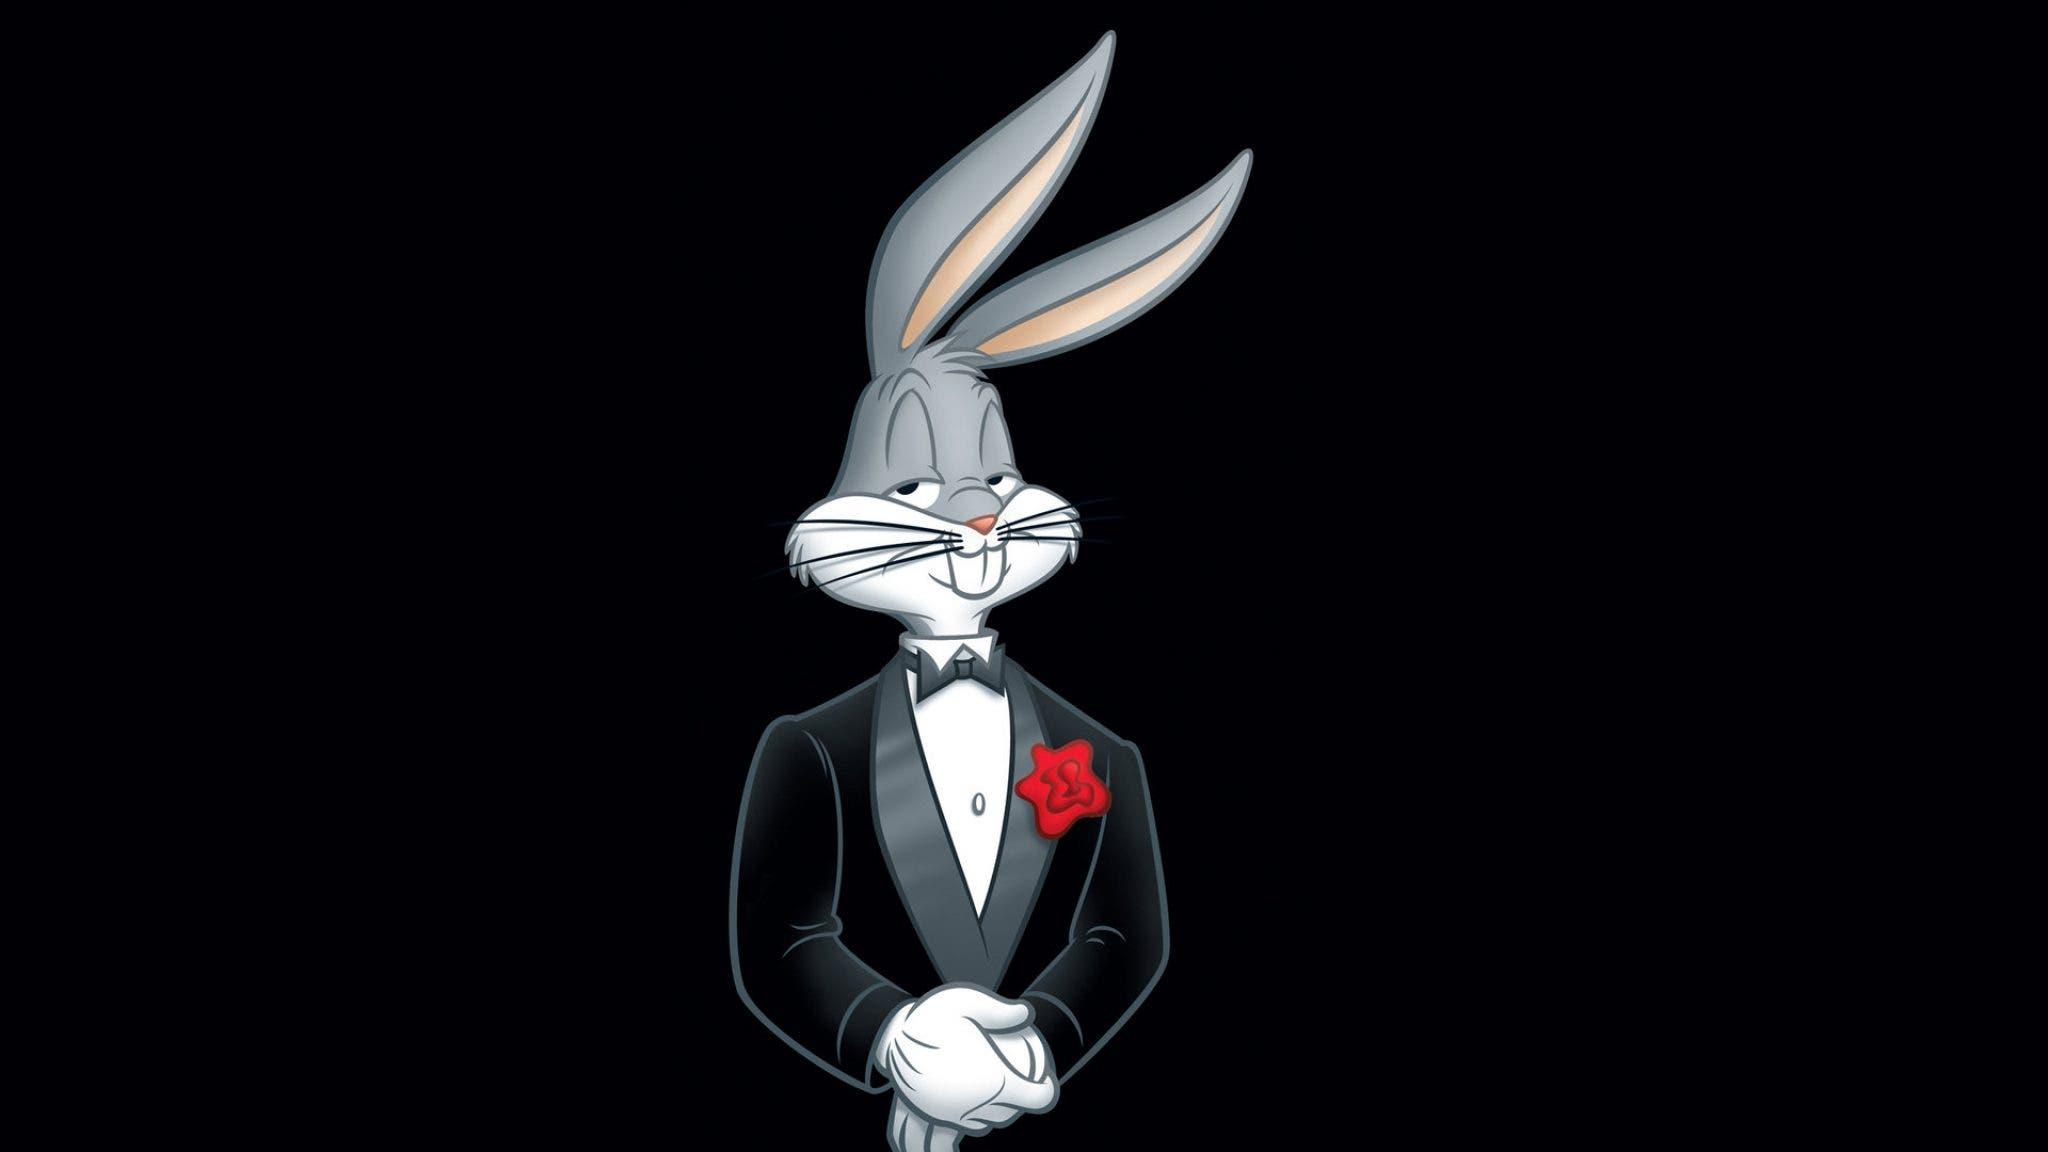 Pastel de Conejo (Peter Rabbit)